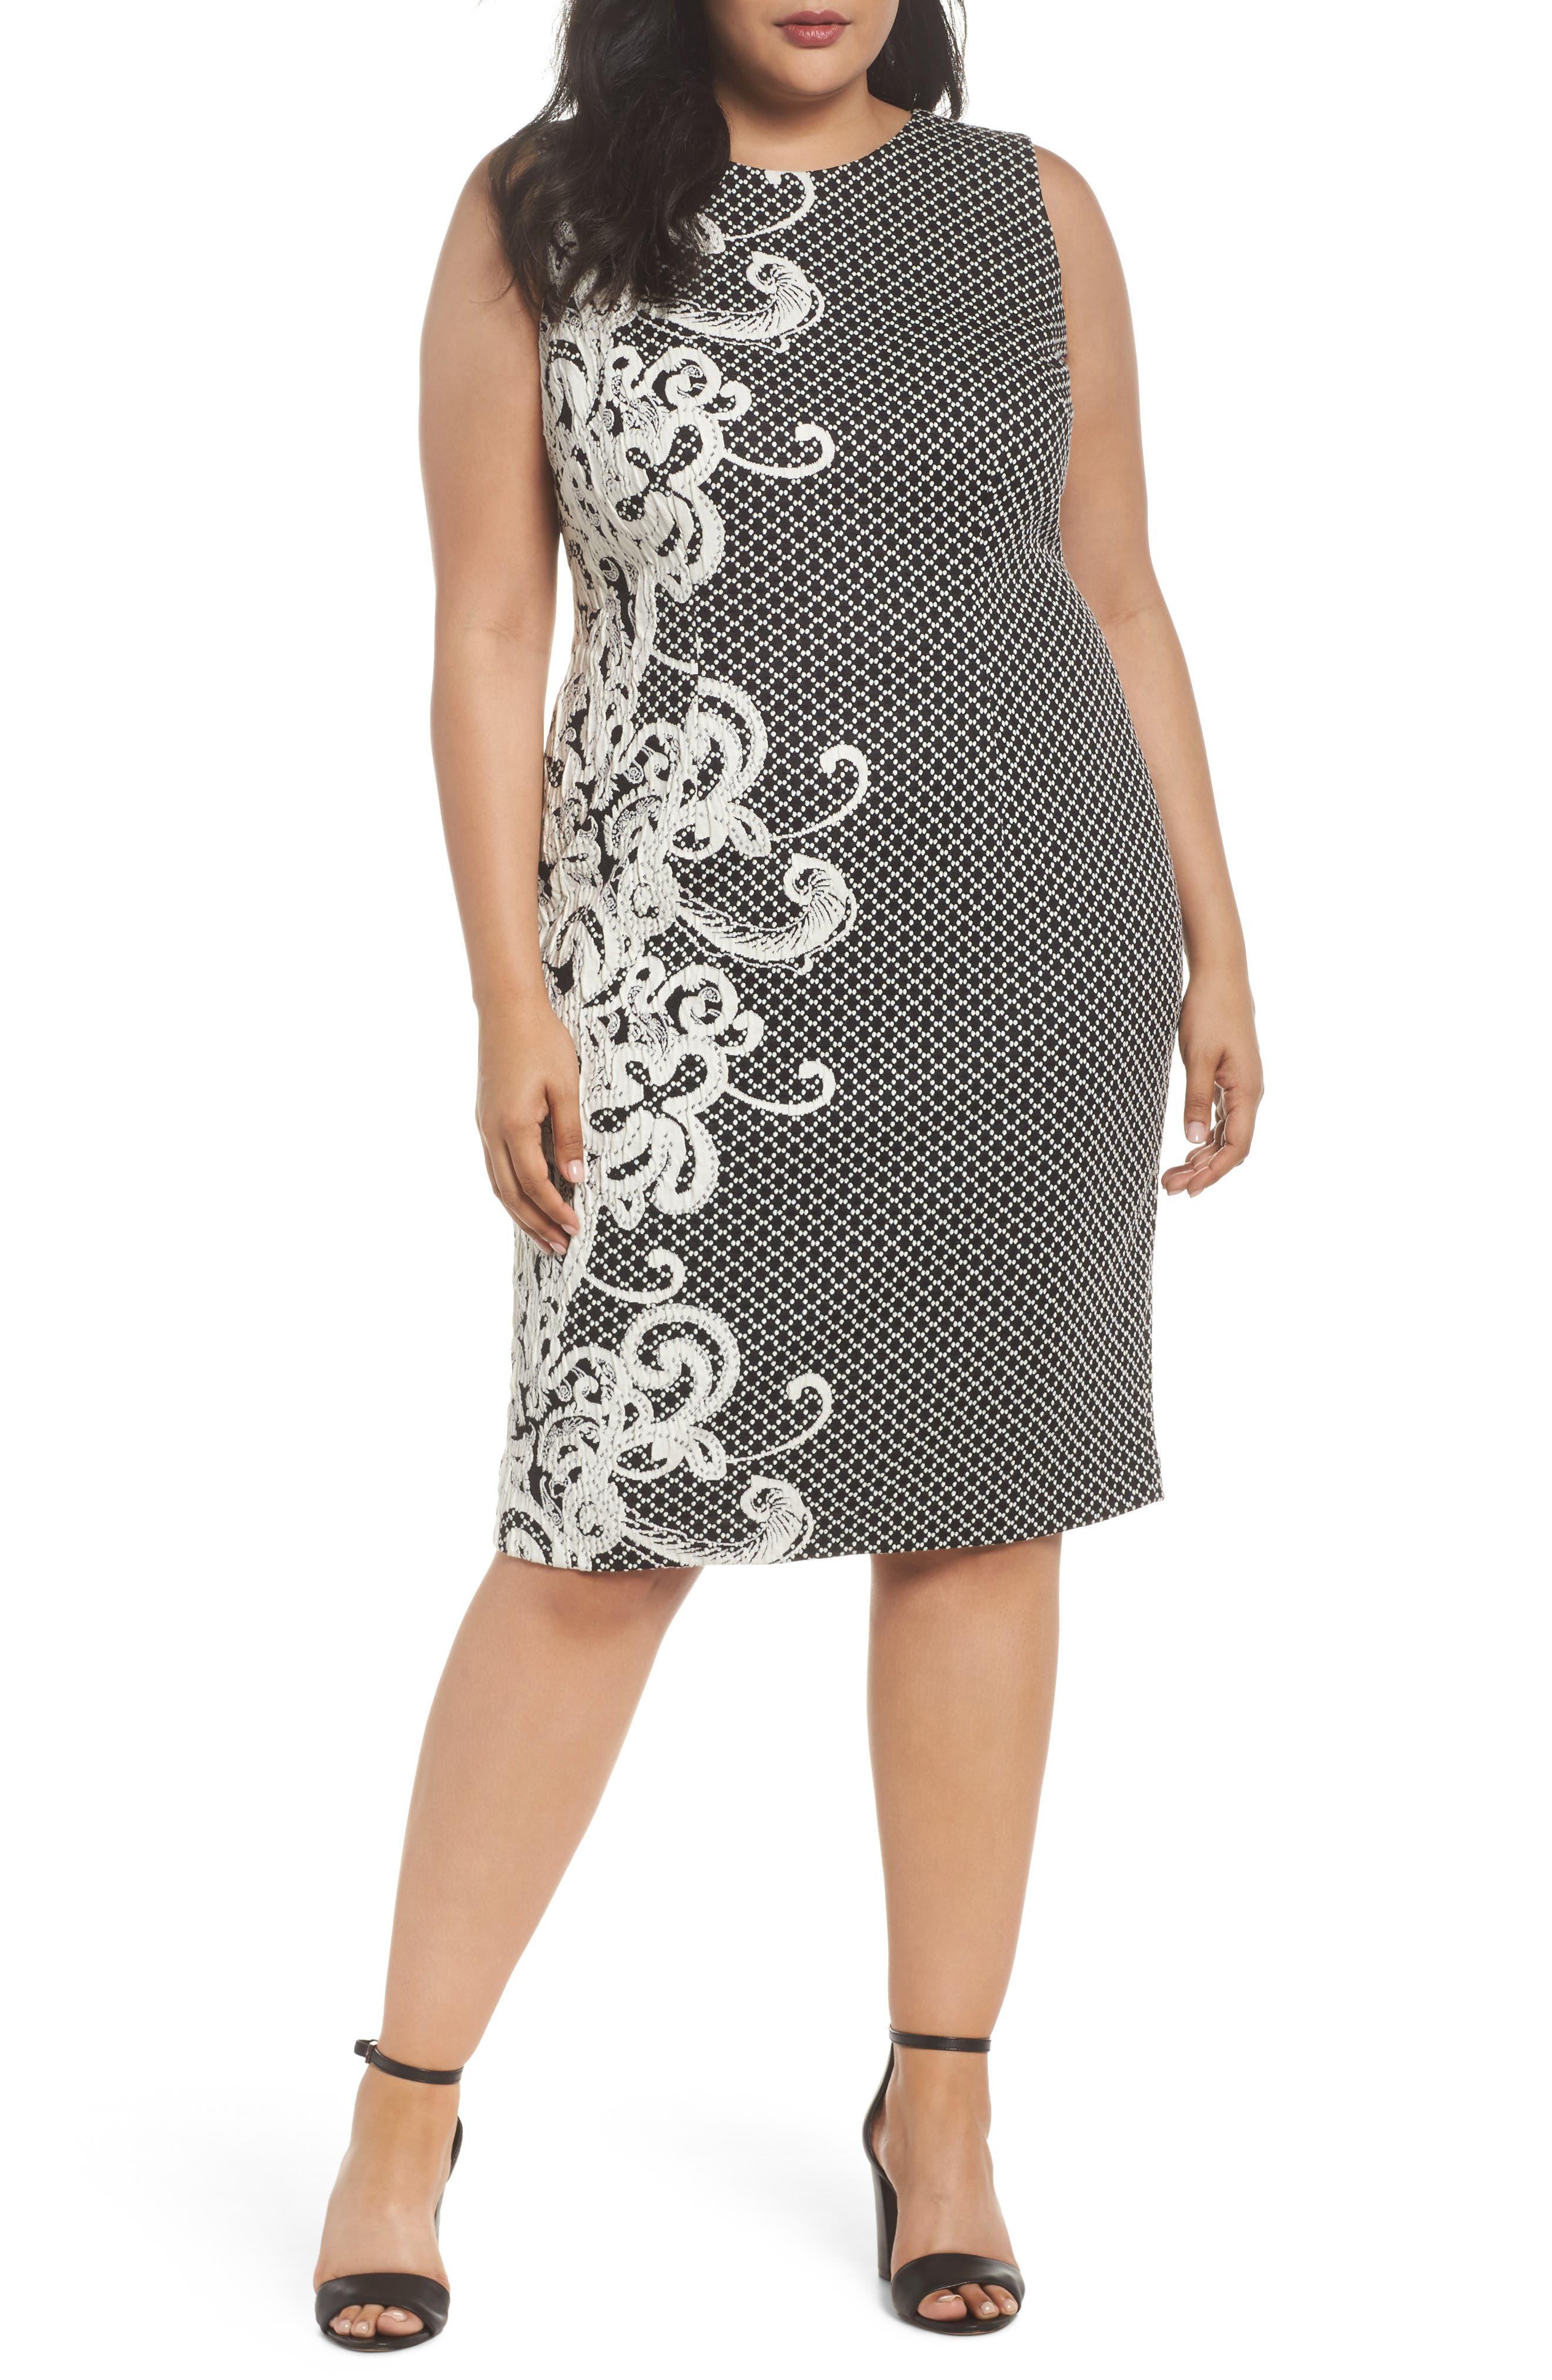 Adrianna Papell Scroll Border Knit Sheath Dress (Plus Size)